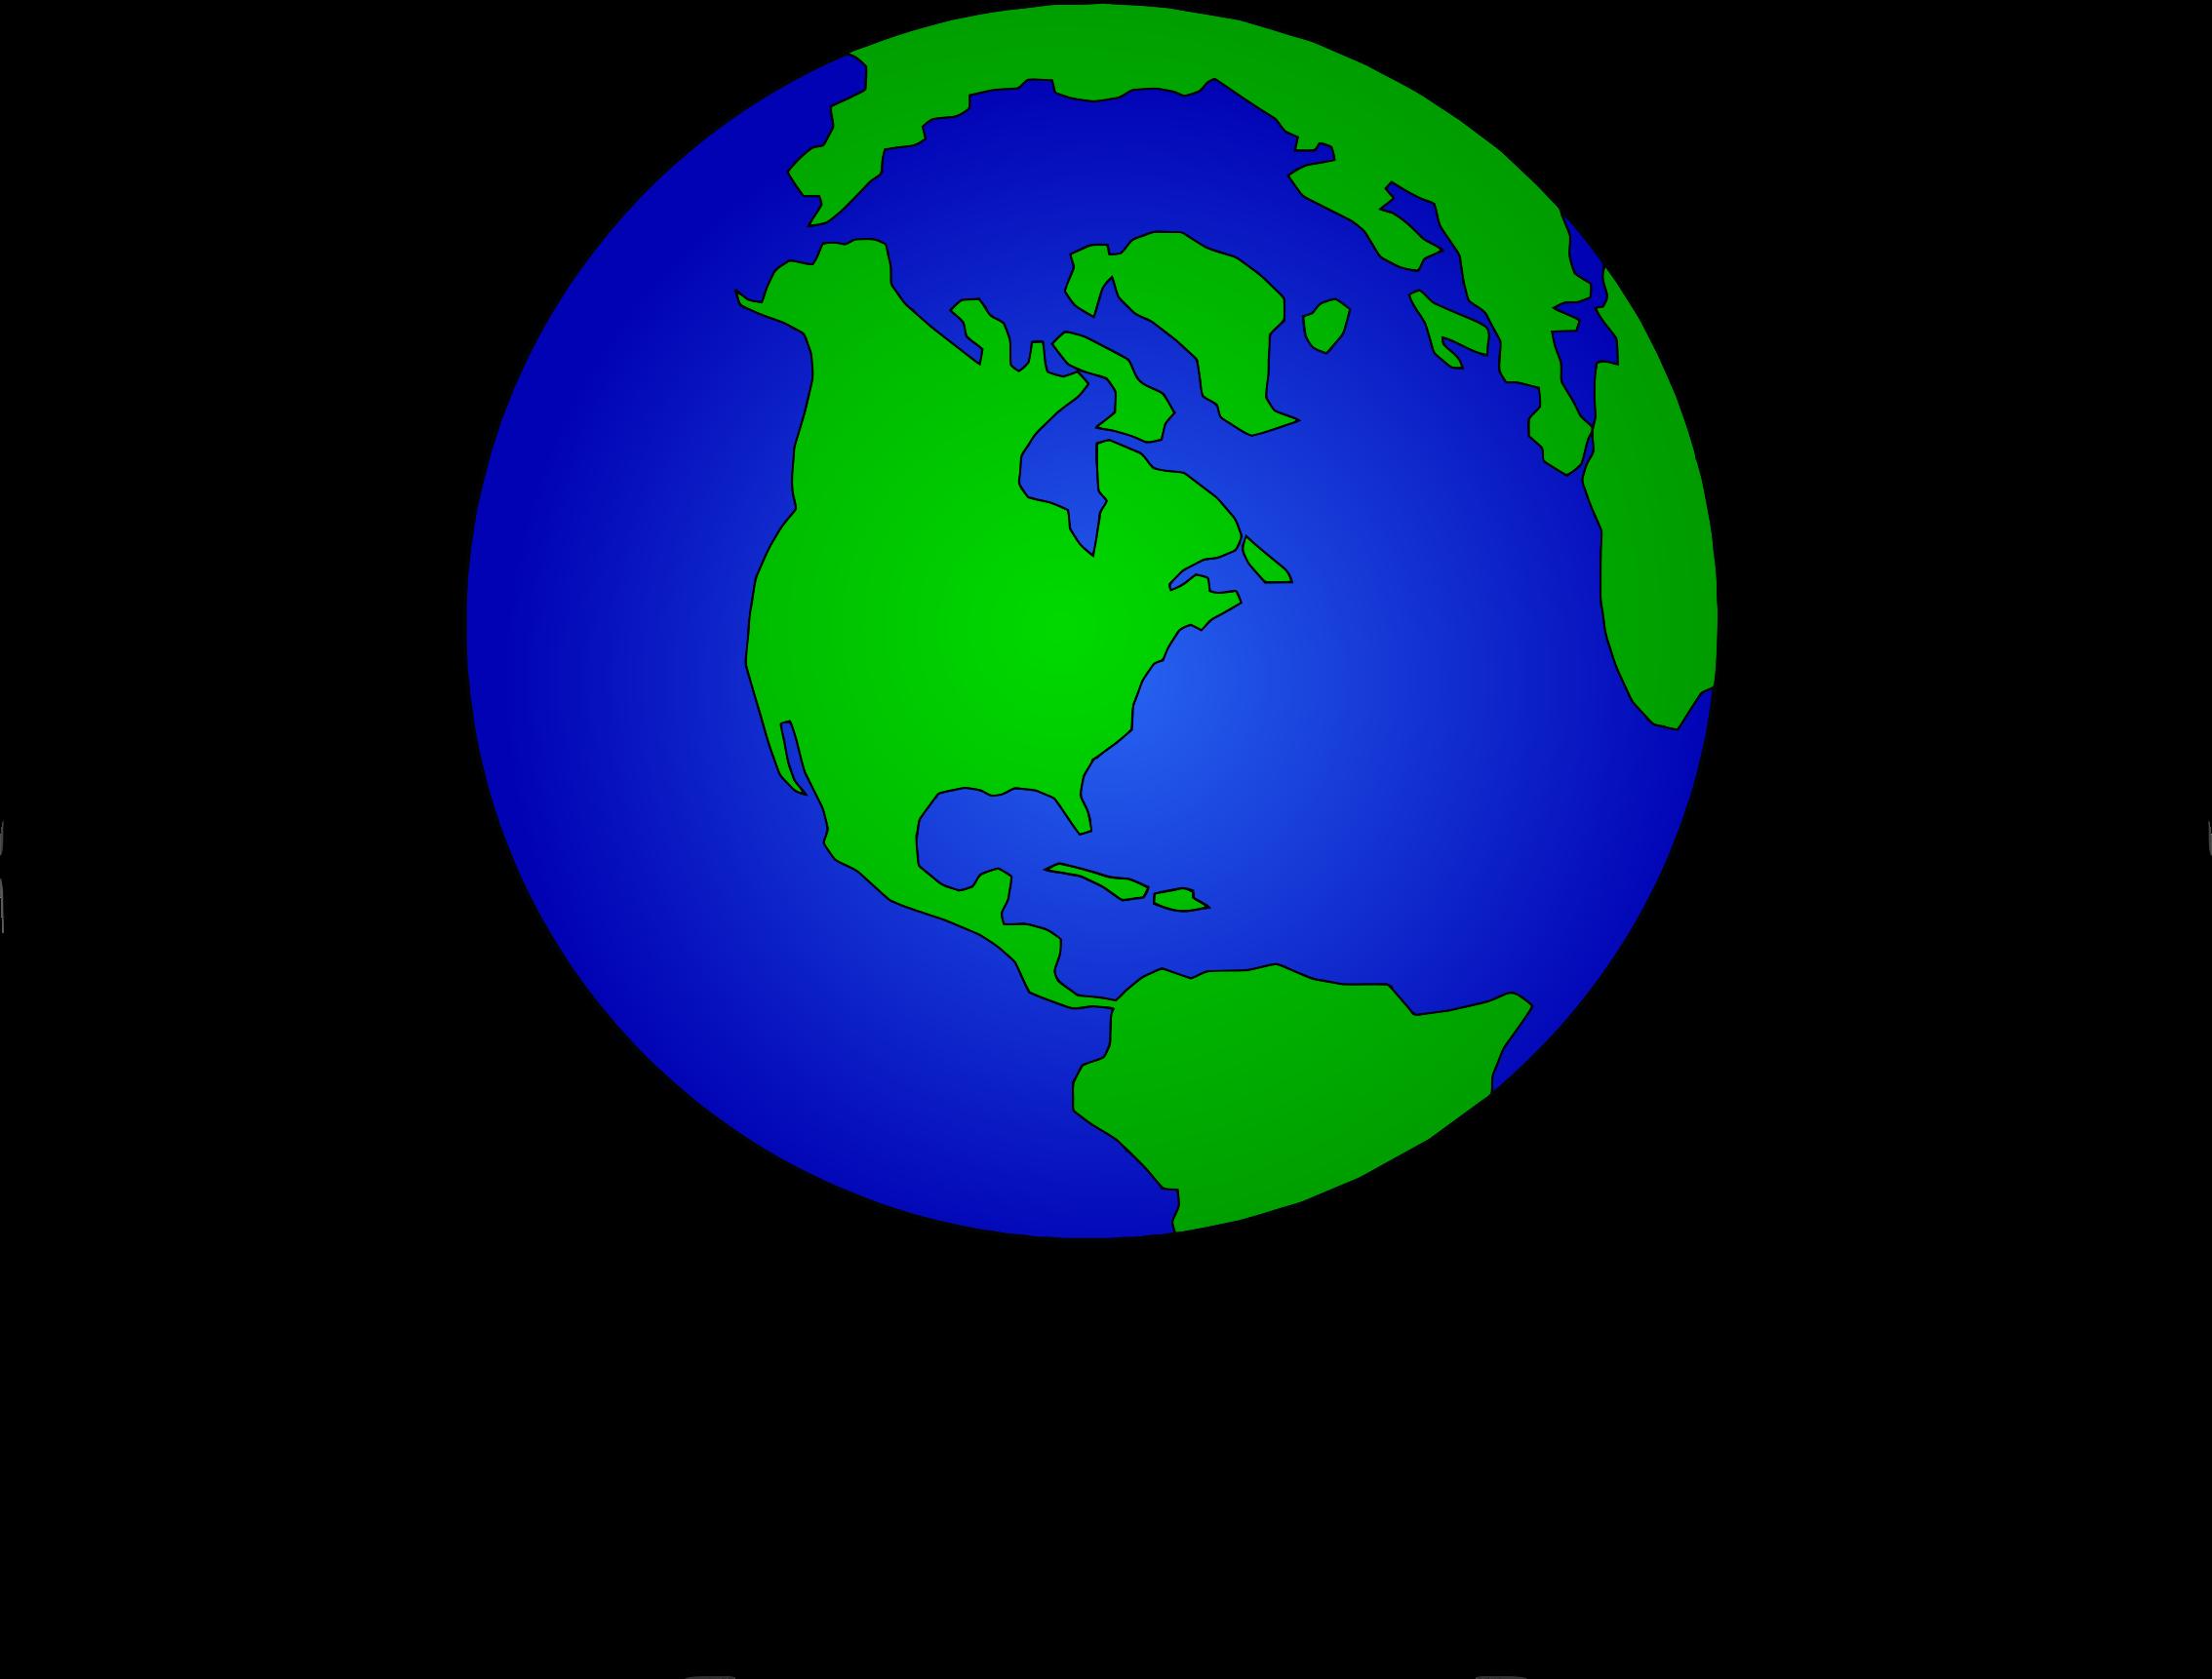 20 America clipart globe for free download on Premium art.